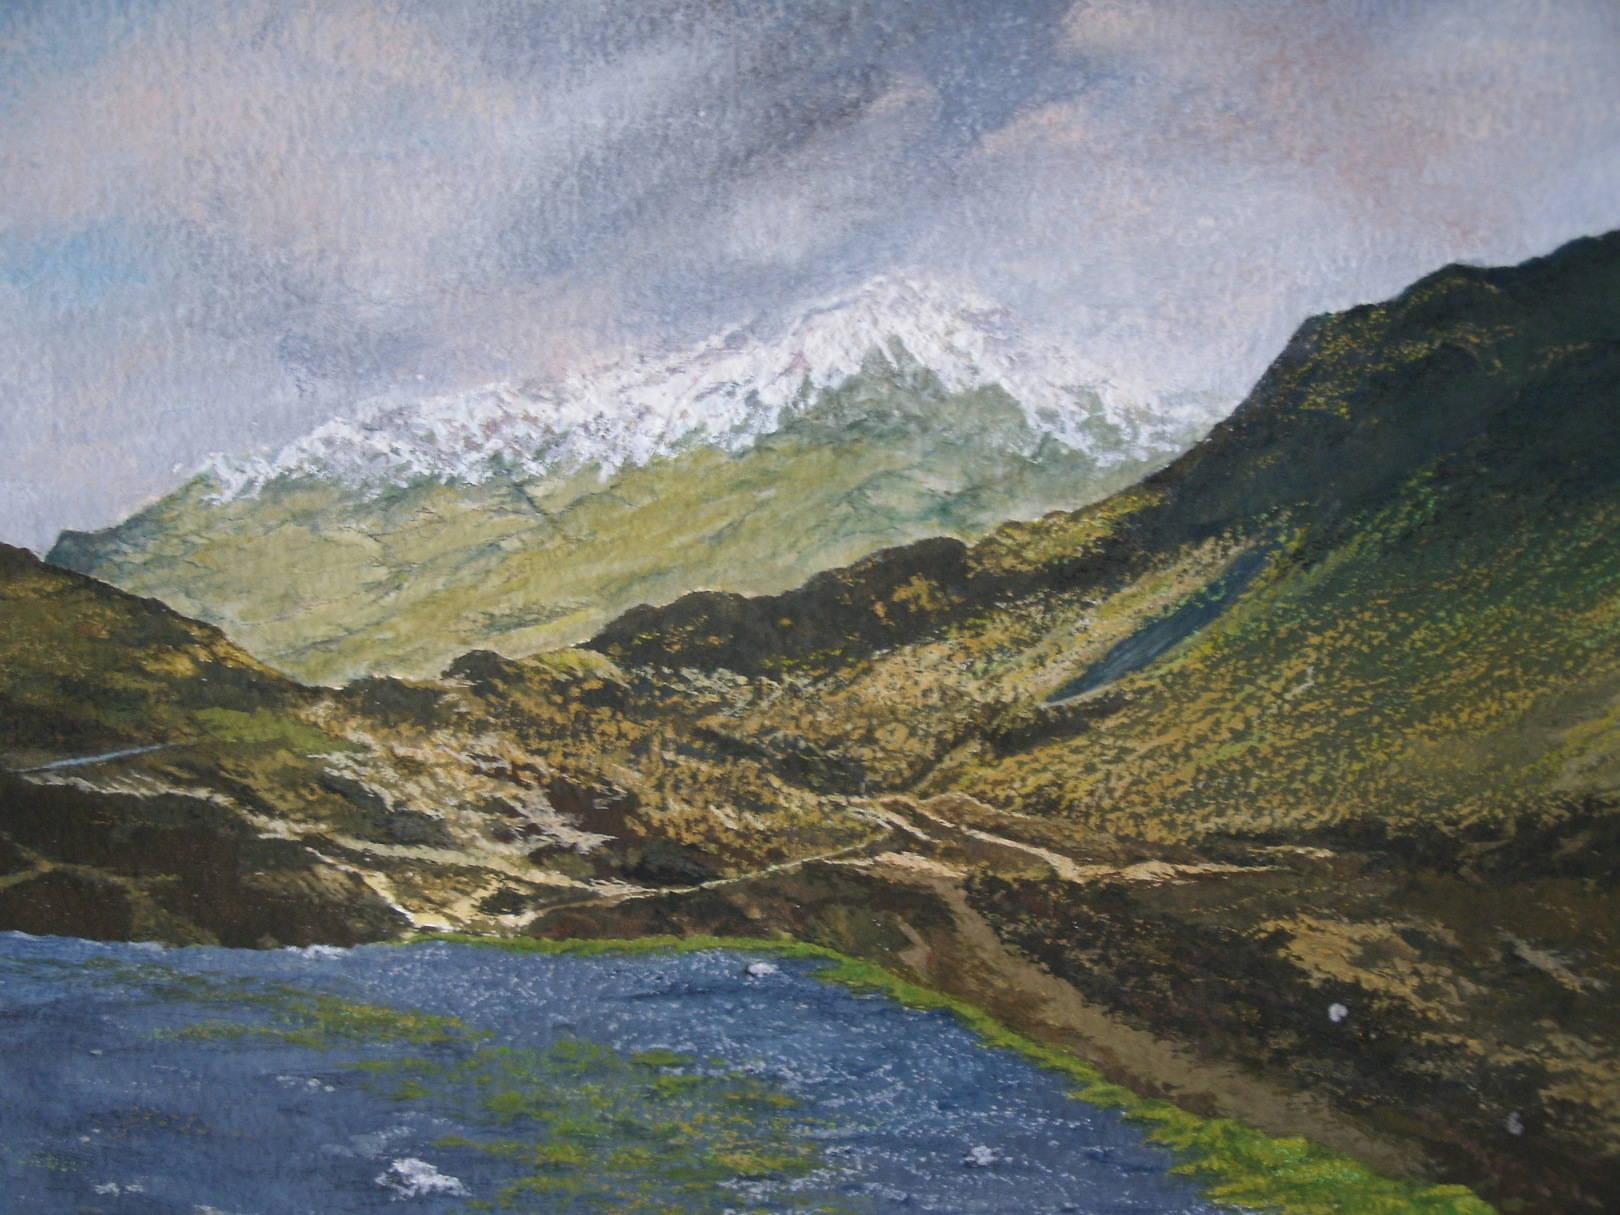 Title: Up on a Mountain Top  Ben Nevis Mountain range, Scotland